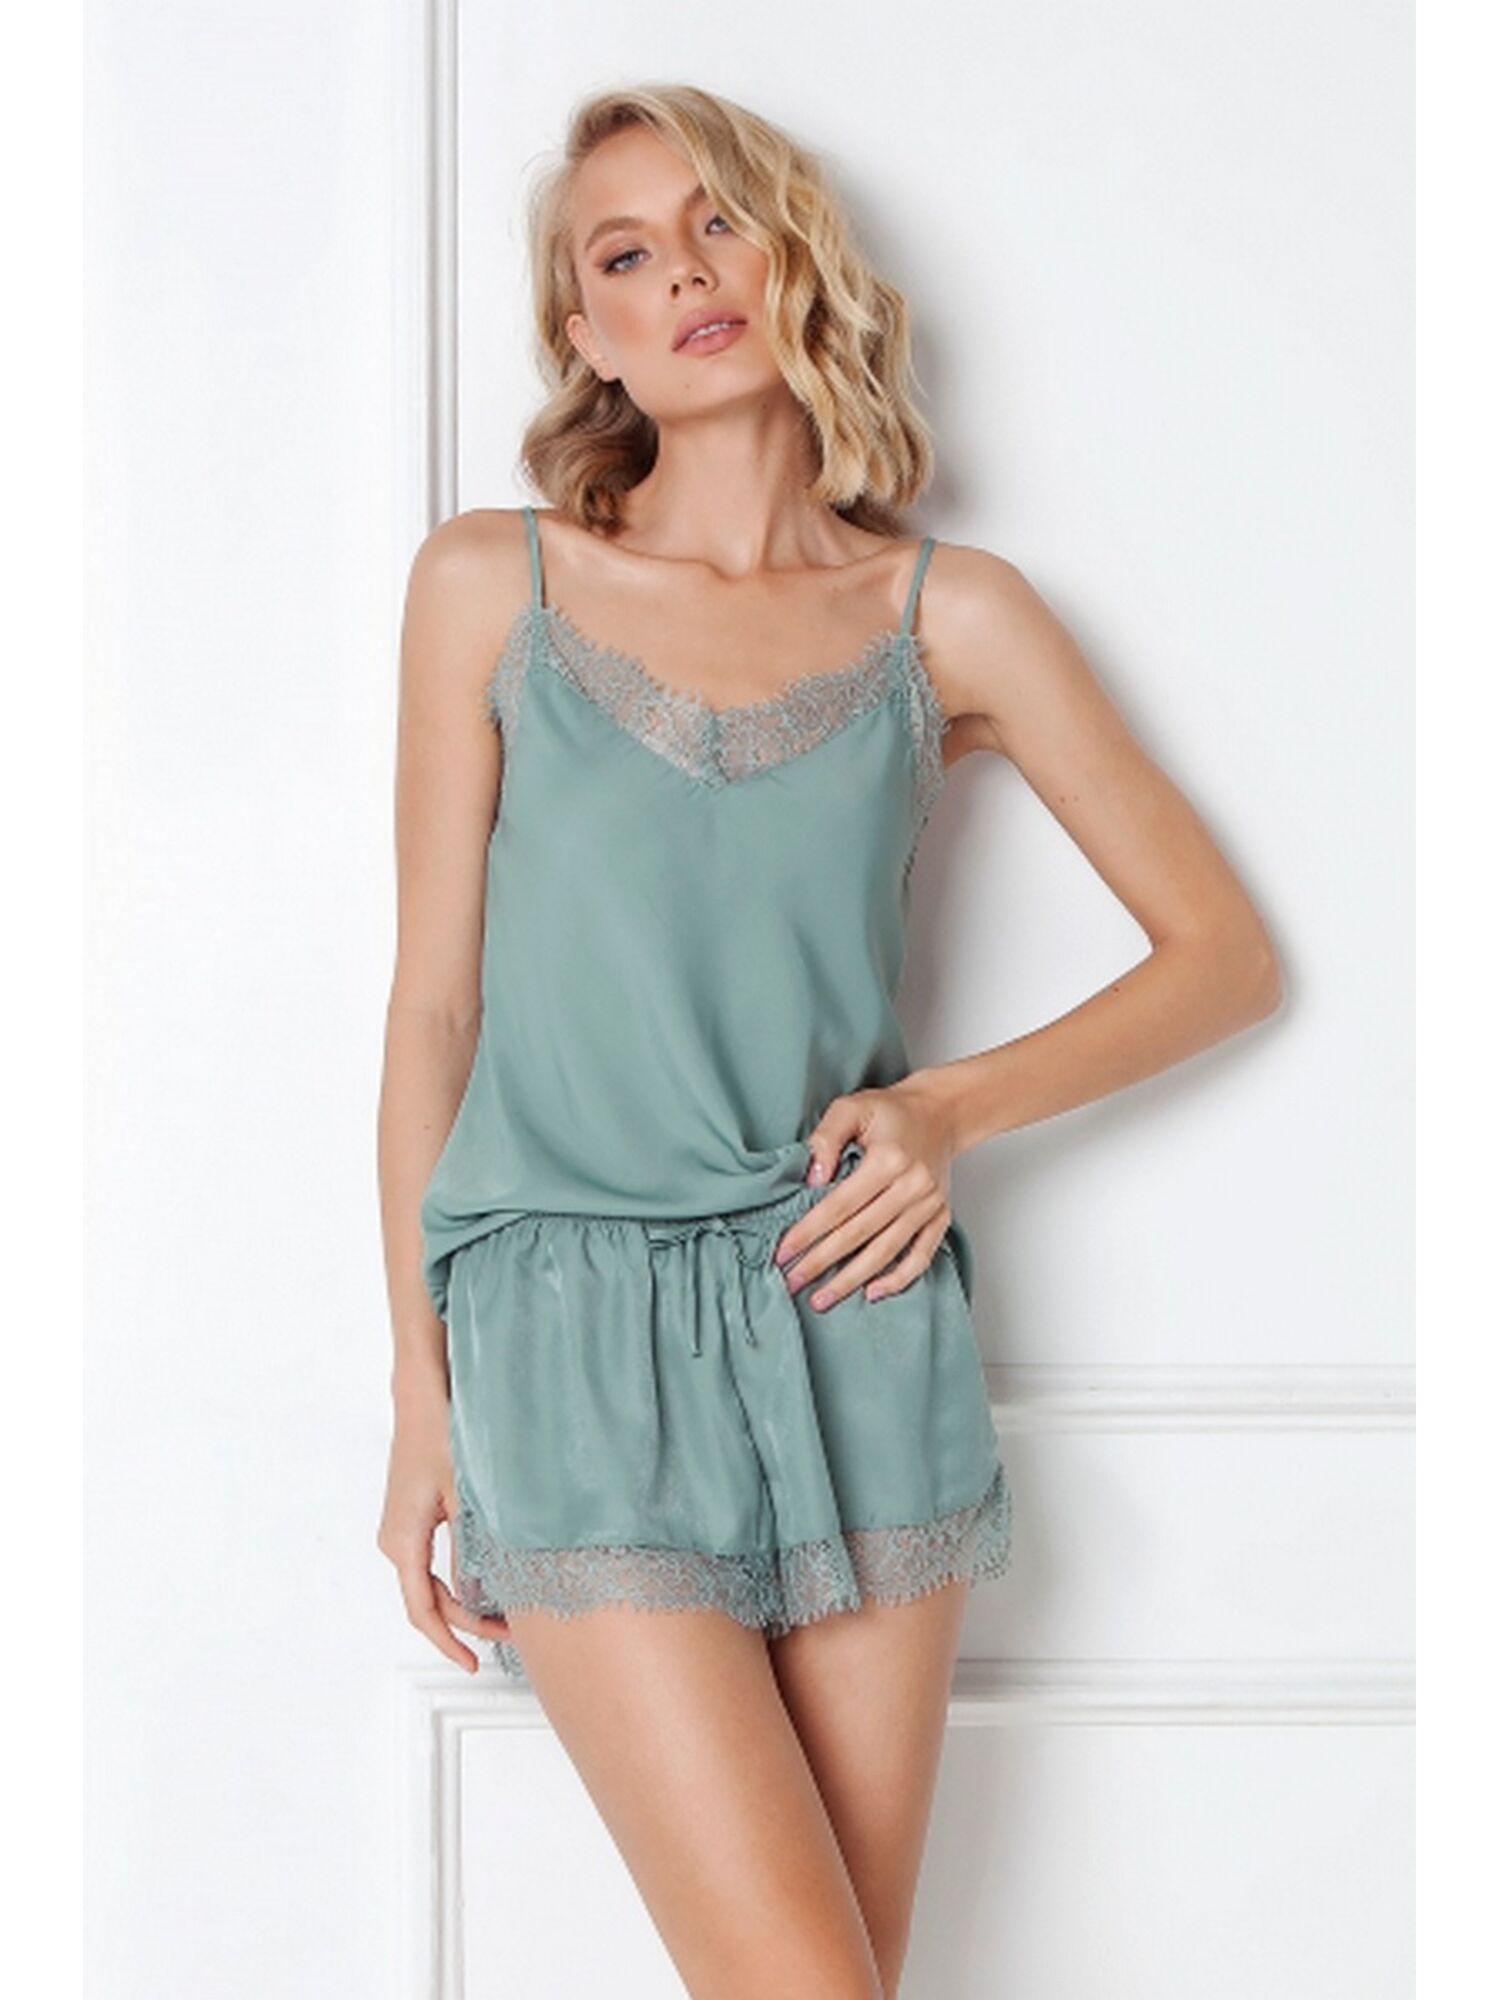 Пижама женская с шортами EMERY, зелёный, ARUELLE